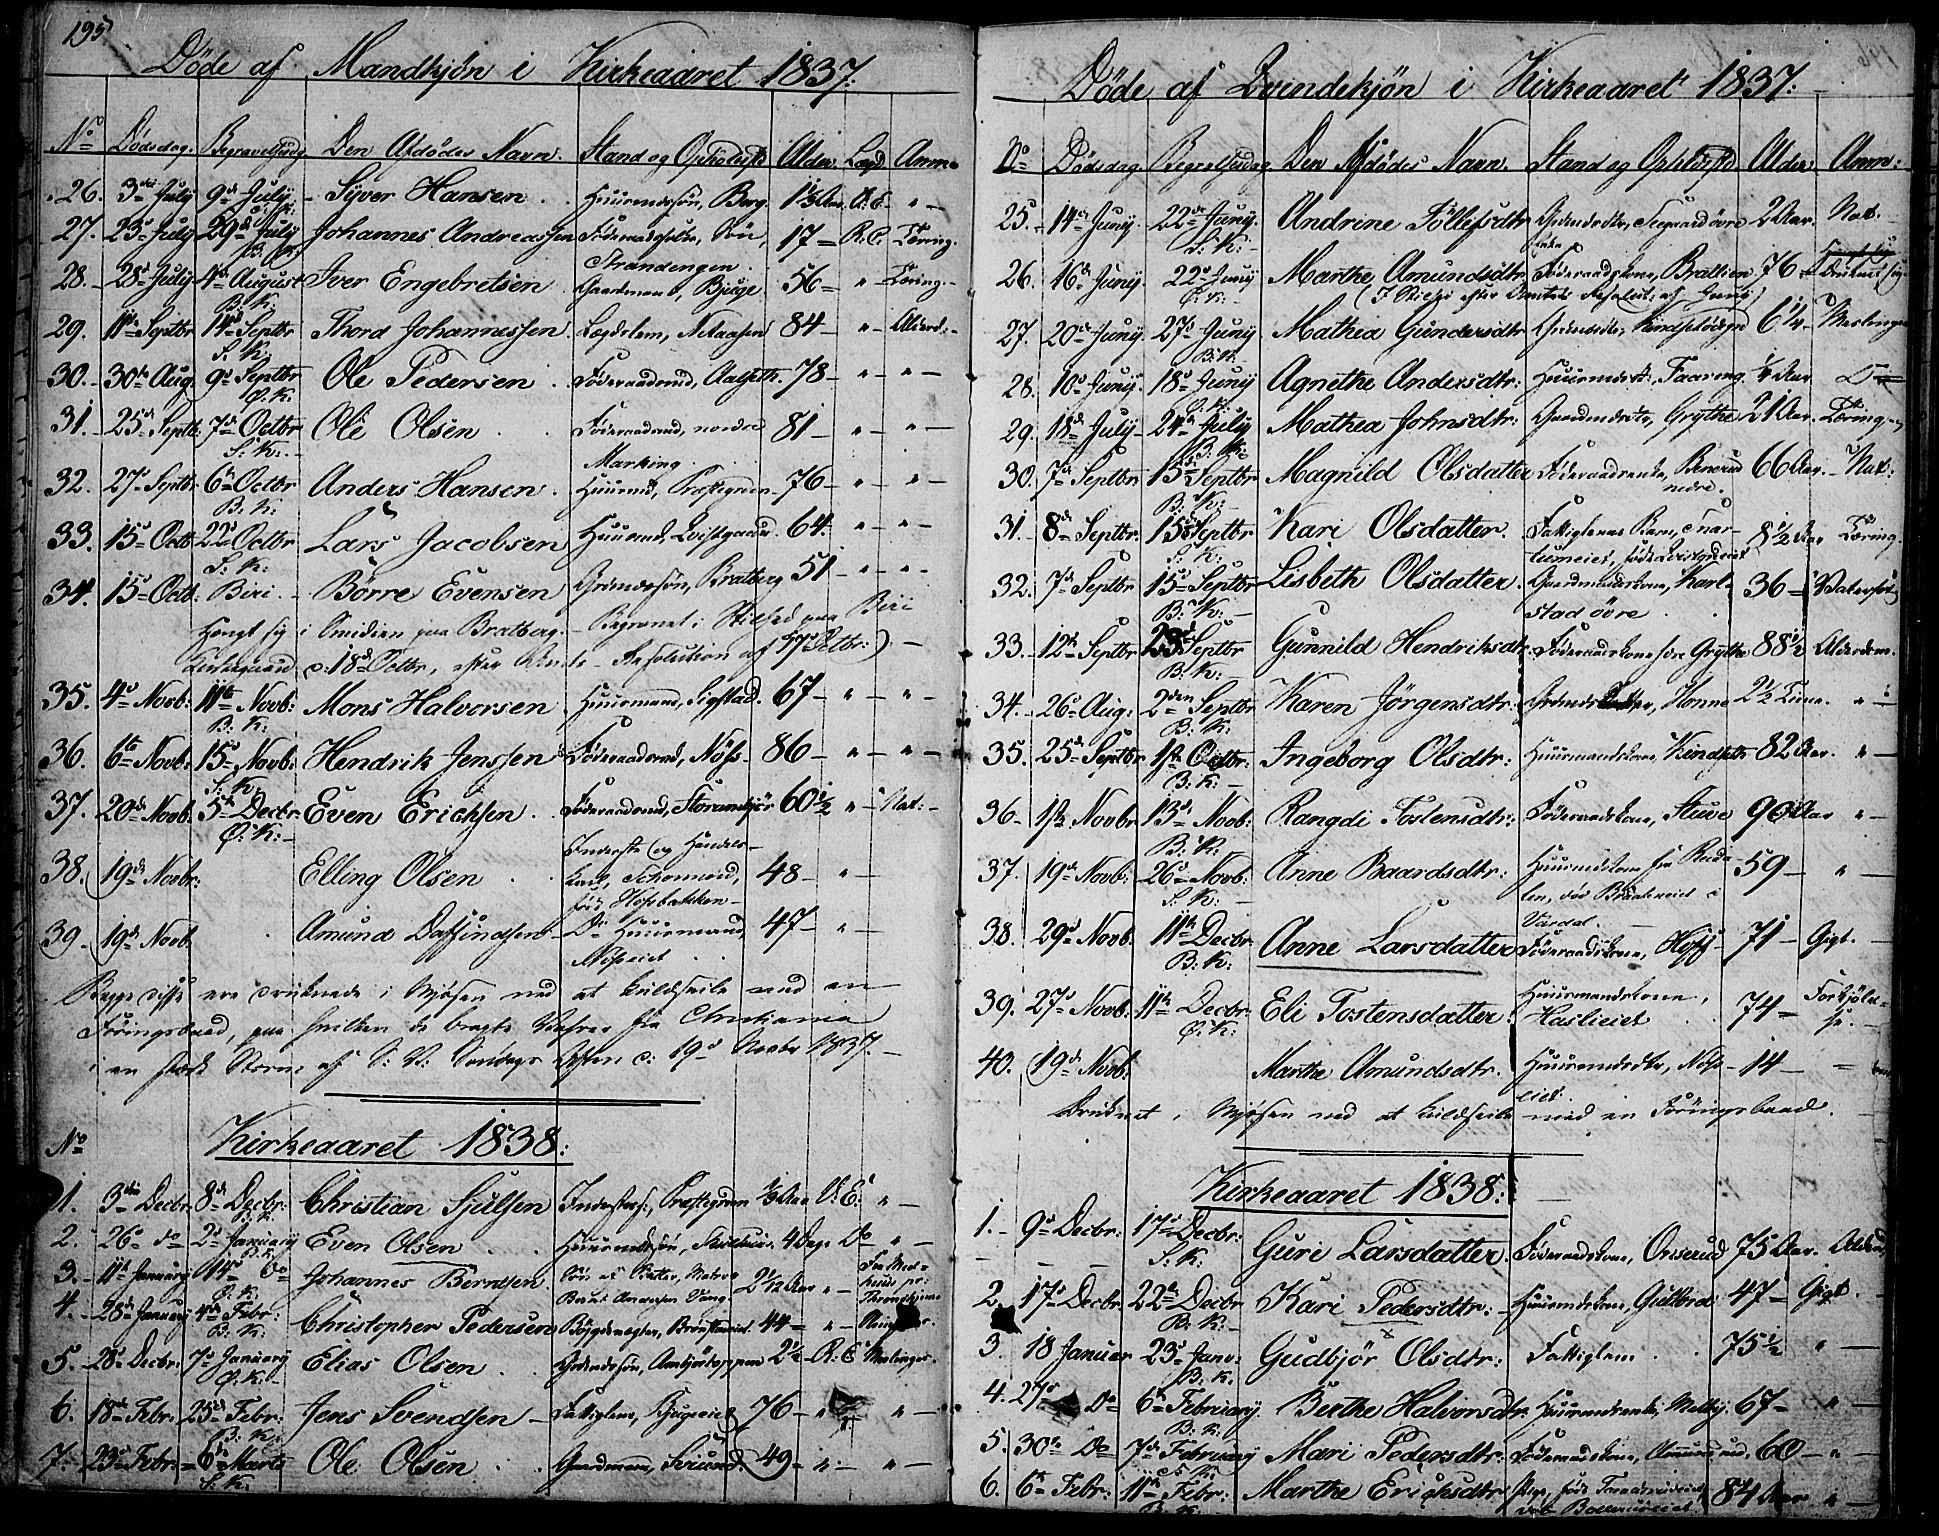 SAH, Biri prestekontor, Ministerialbok nr. 4, 1829-1842, s. 195